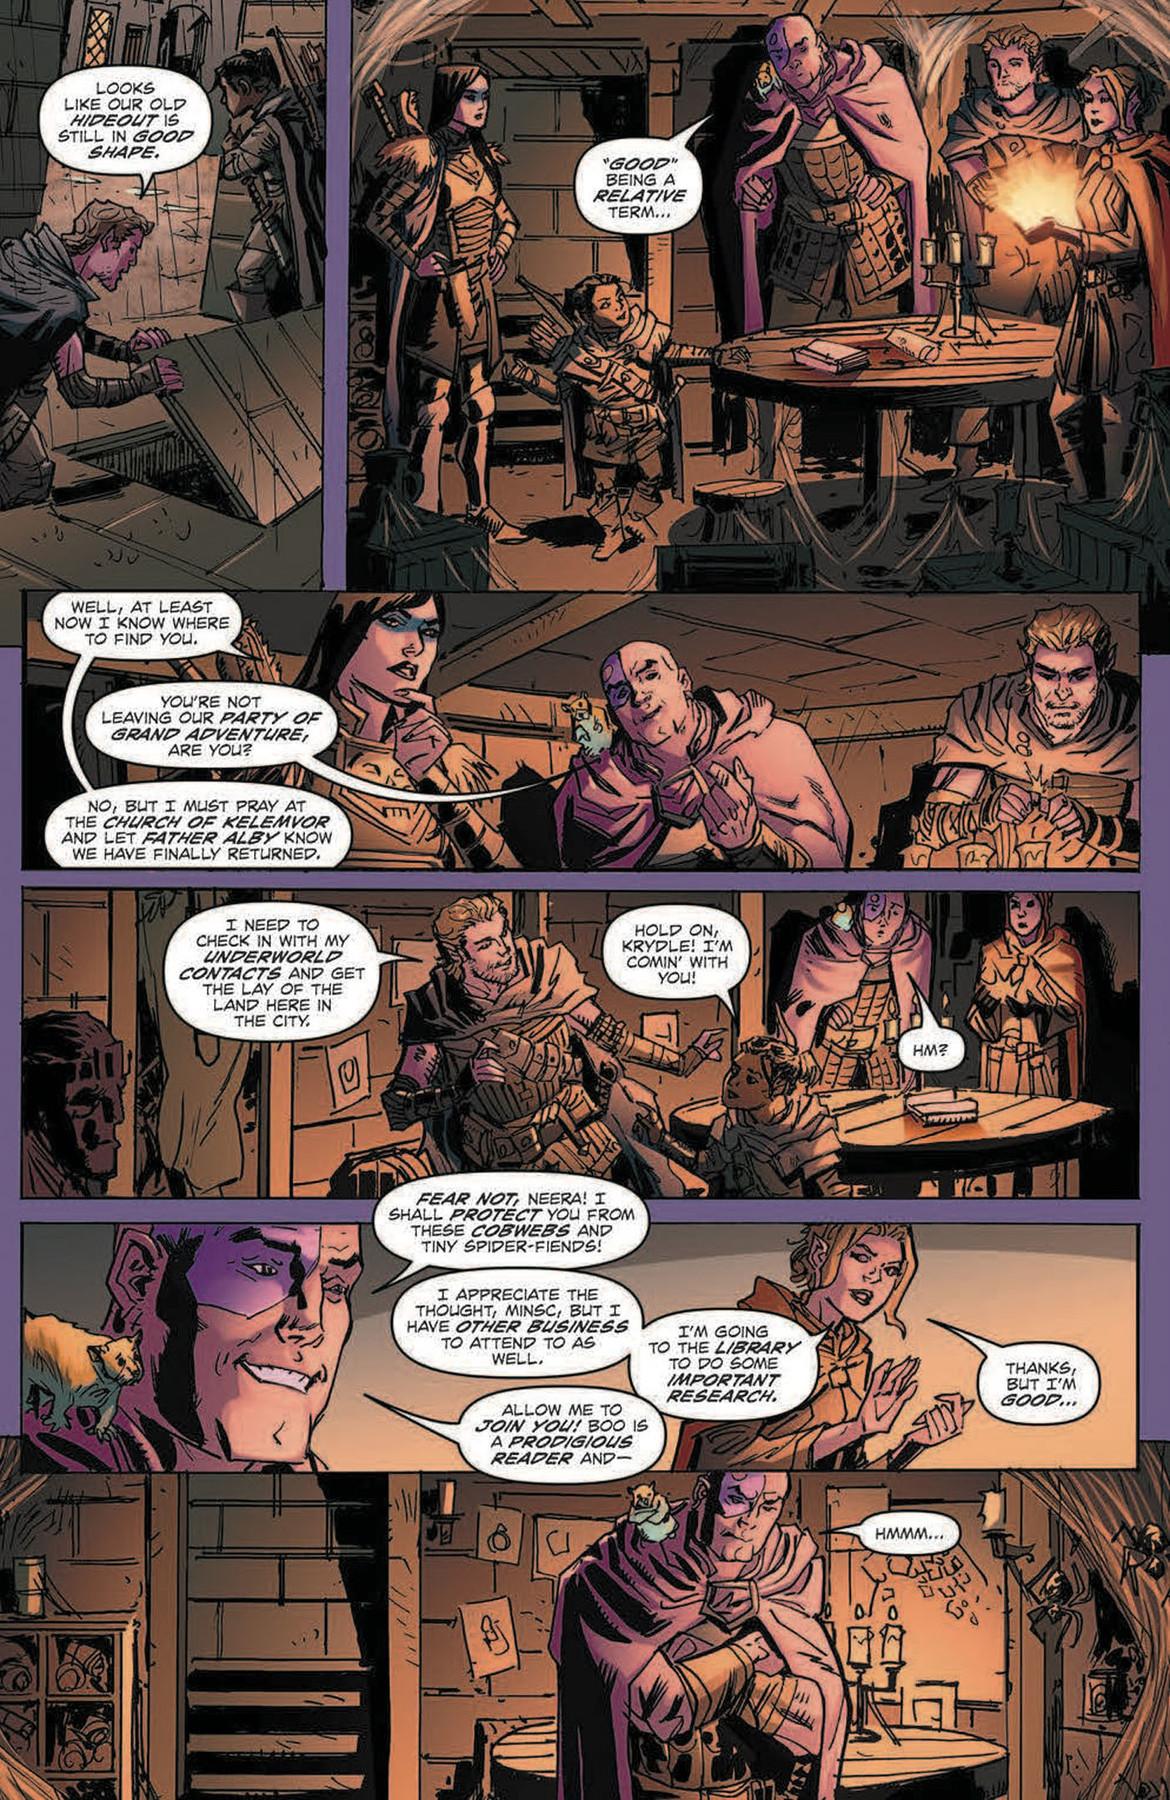 dungeons_and_dragons_evil_at_baldurs_gate_page_4.jpg